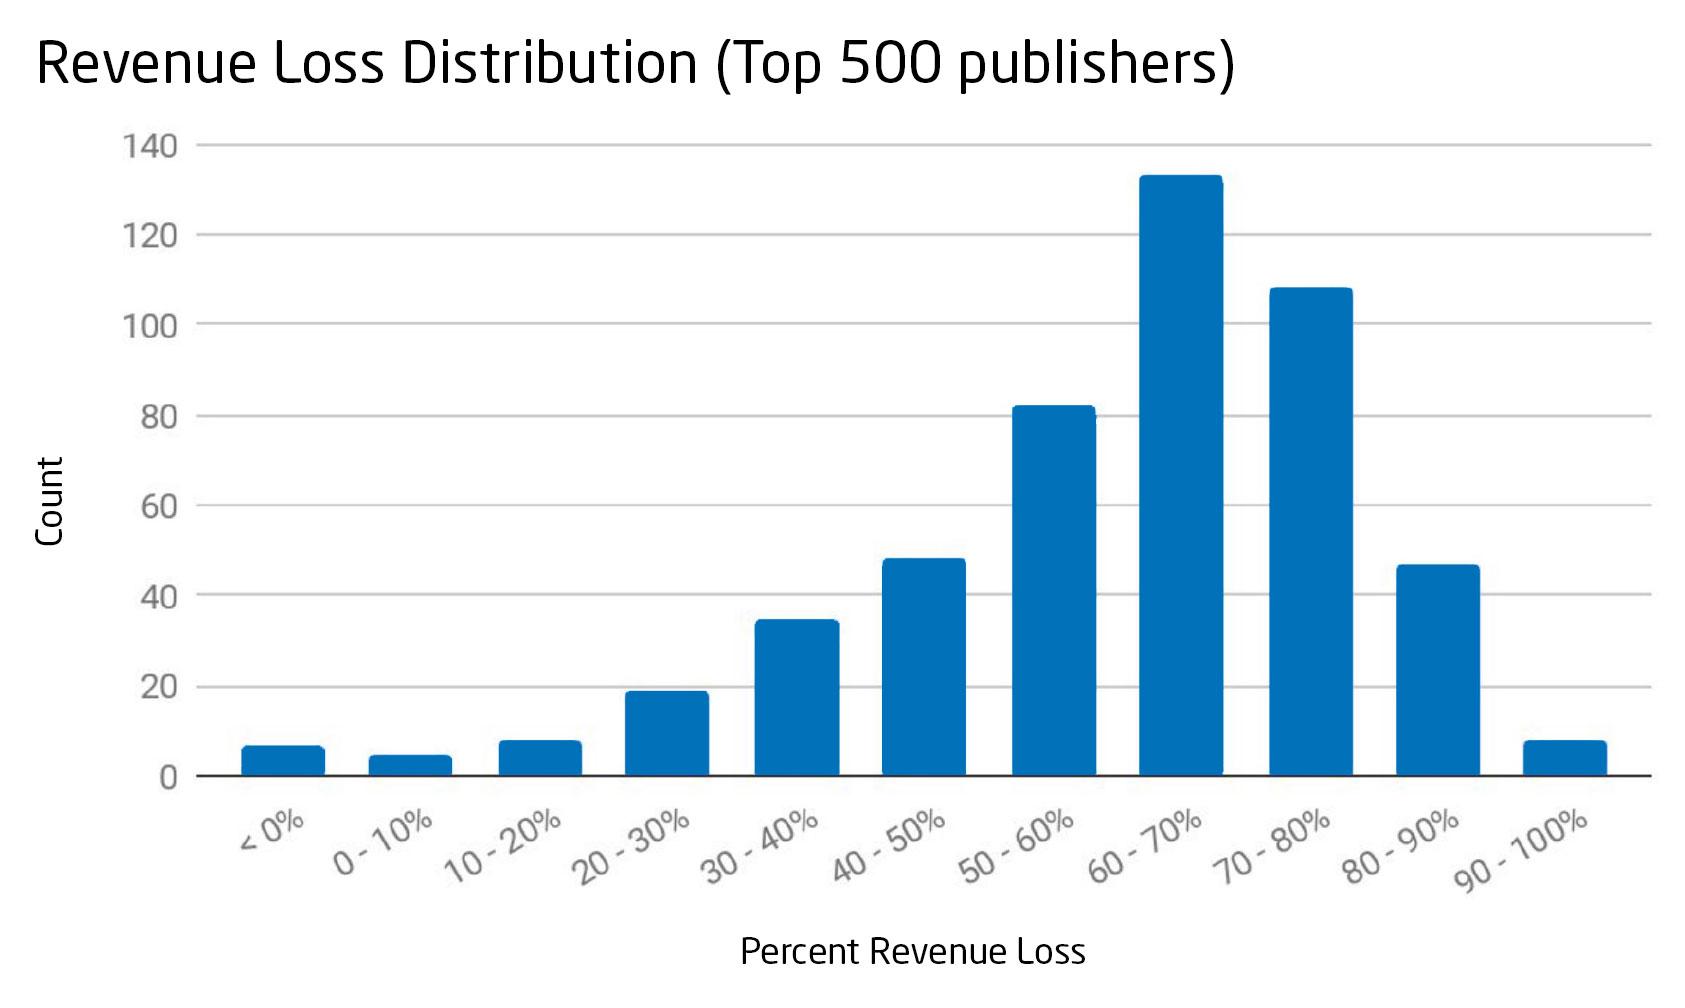 Revenue Loss Distribution